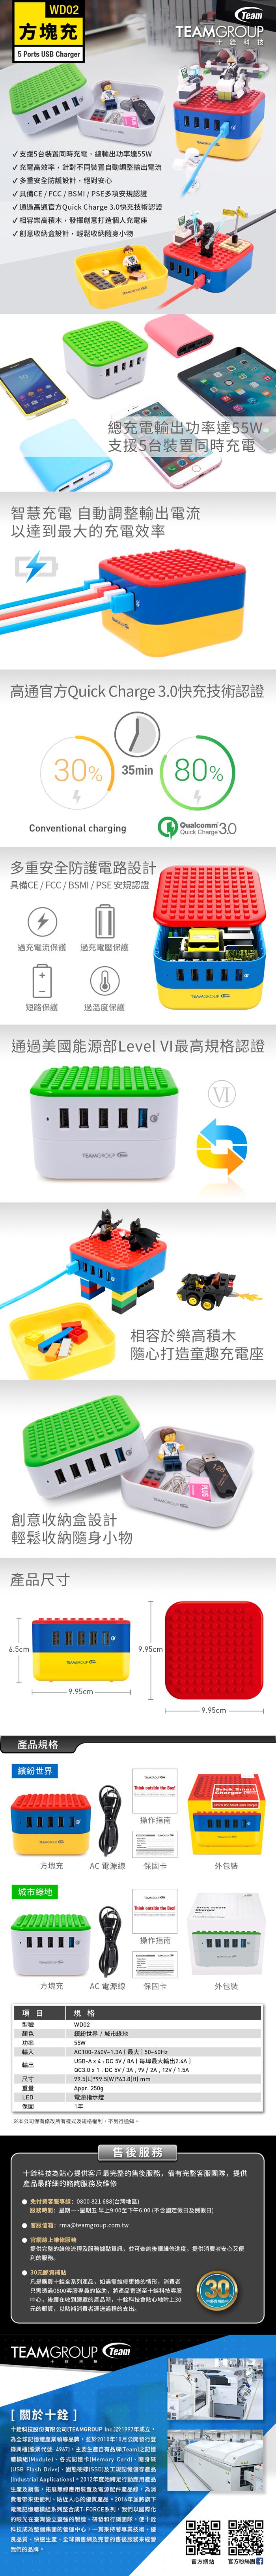 Team Group|WD02 積木方塊充電座-相容樂高積木,支援QC 3.0快充 - 城市綠地